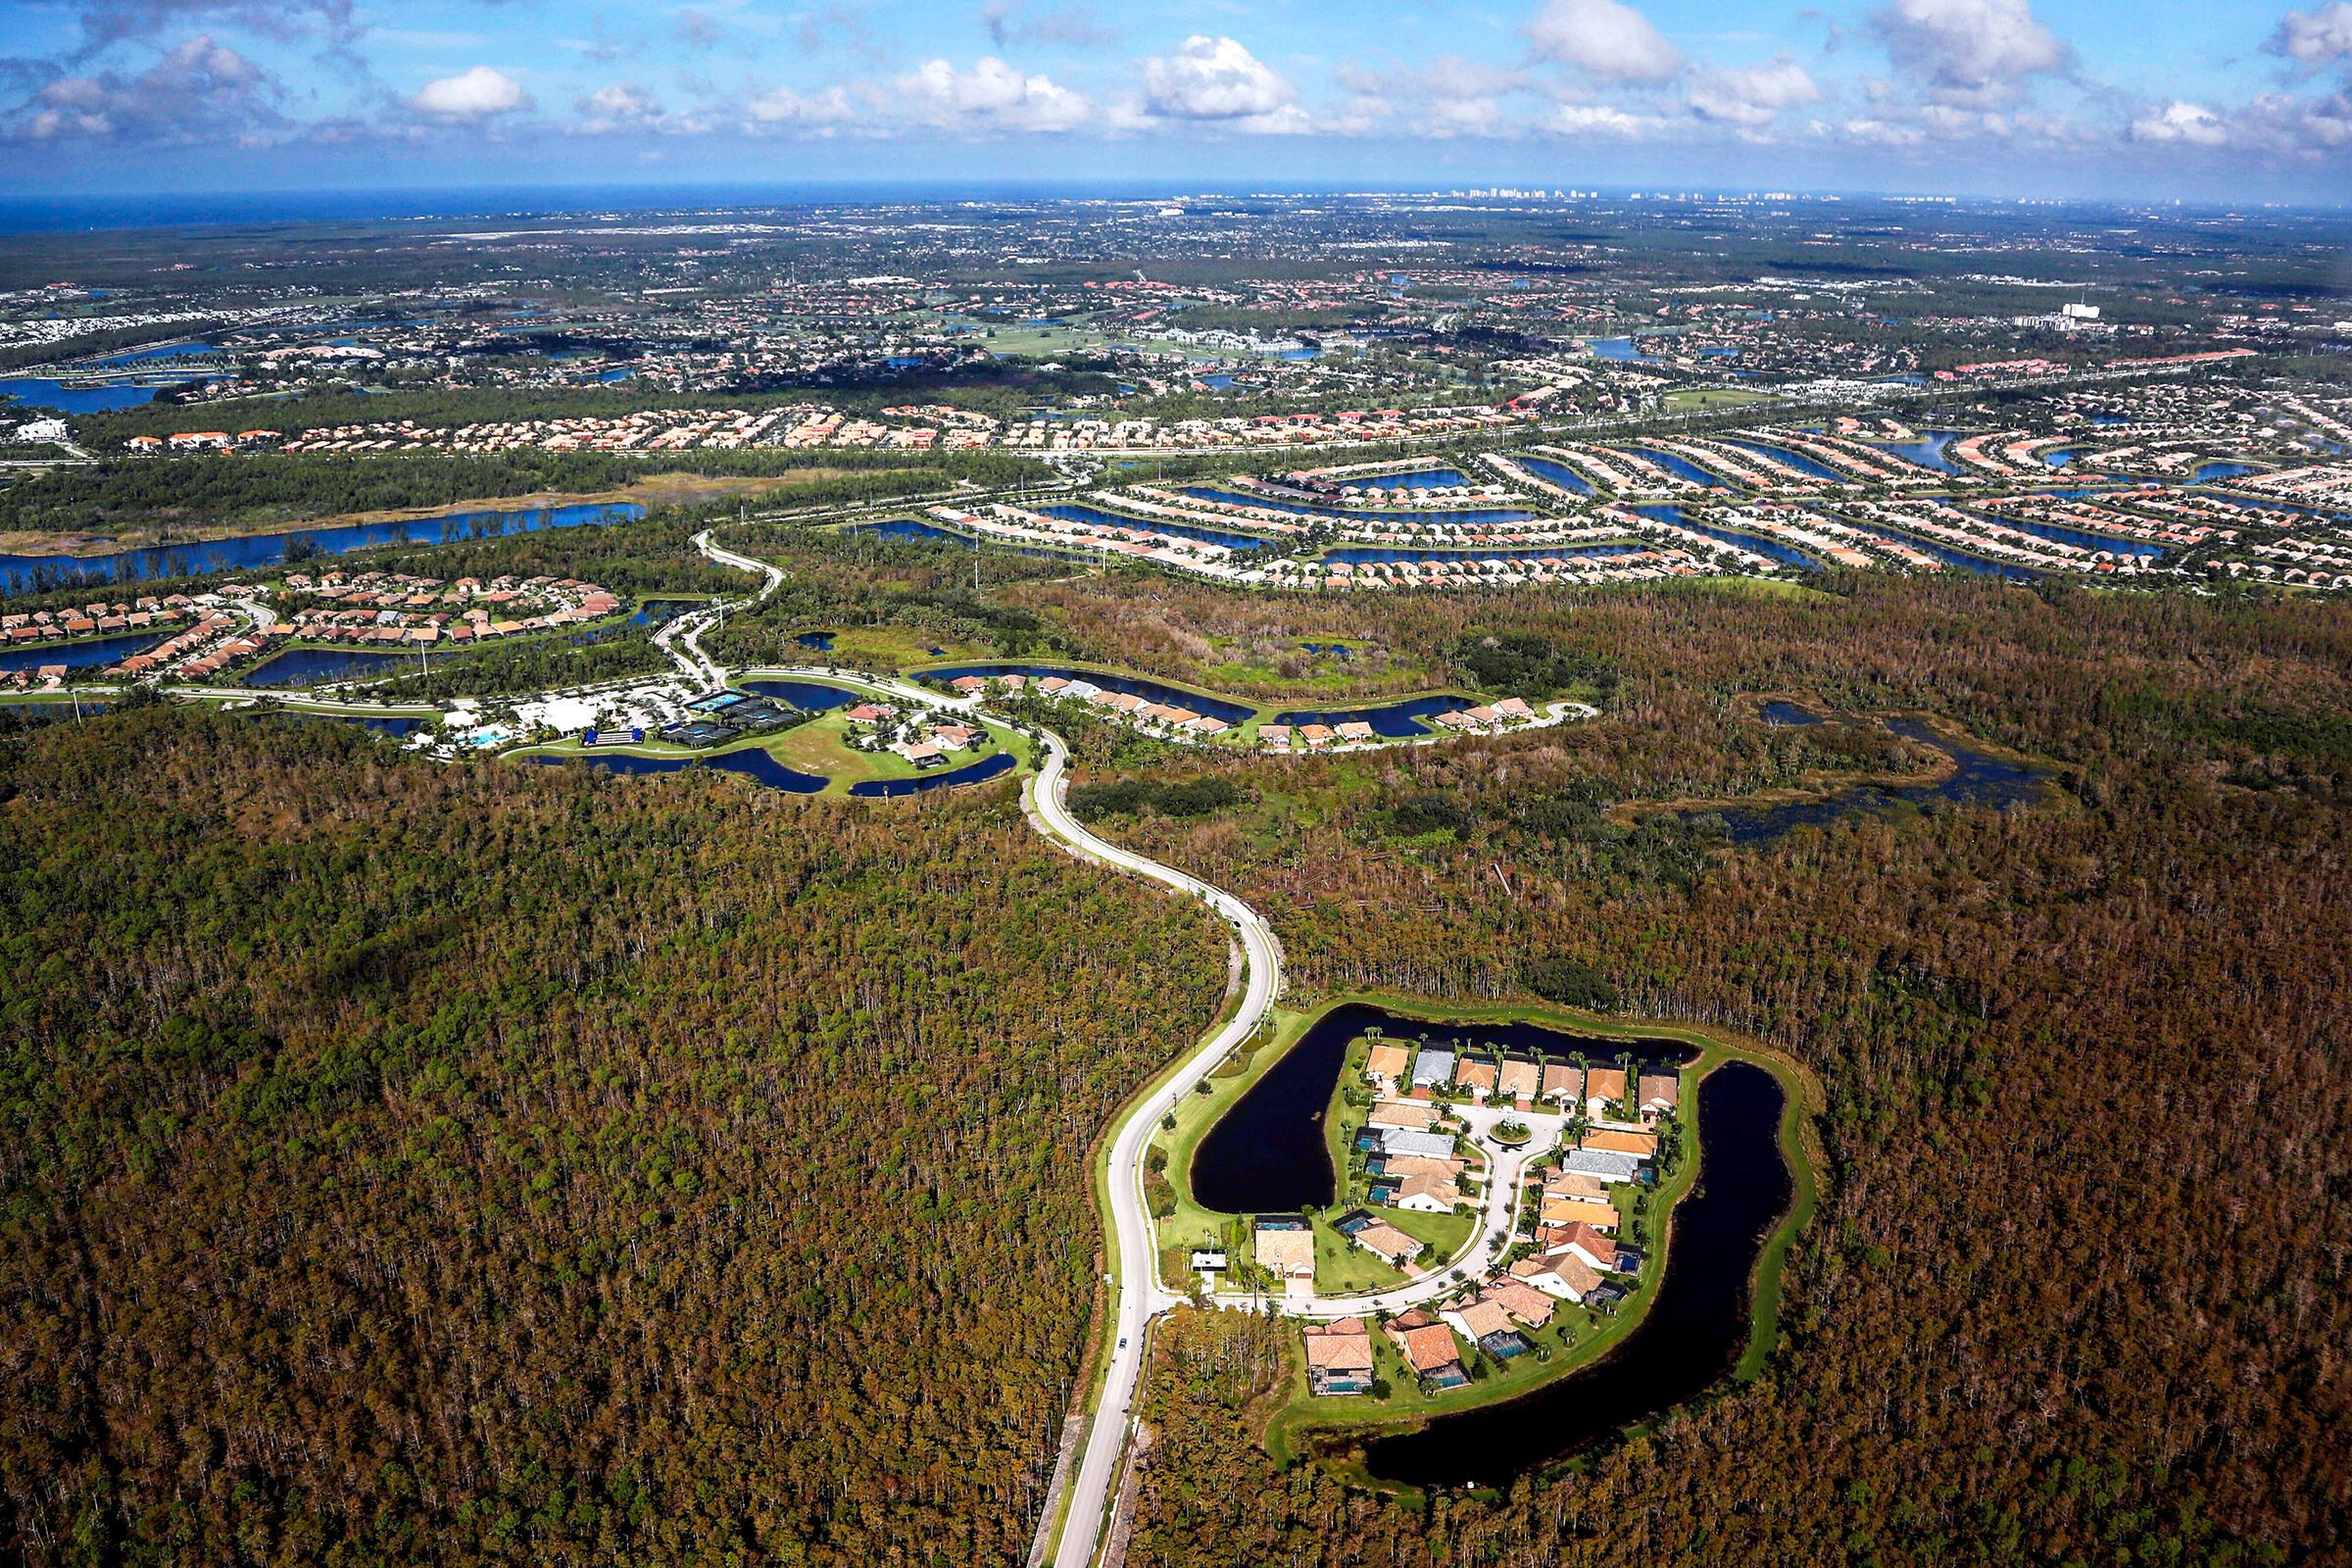 A housing development in the Everglades, Florida. Robert F. Bukaty/AP